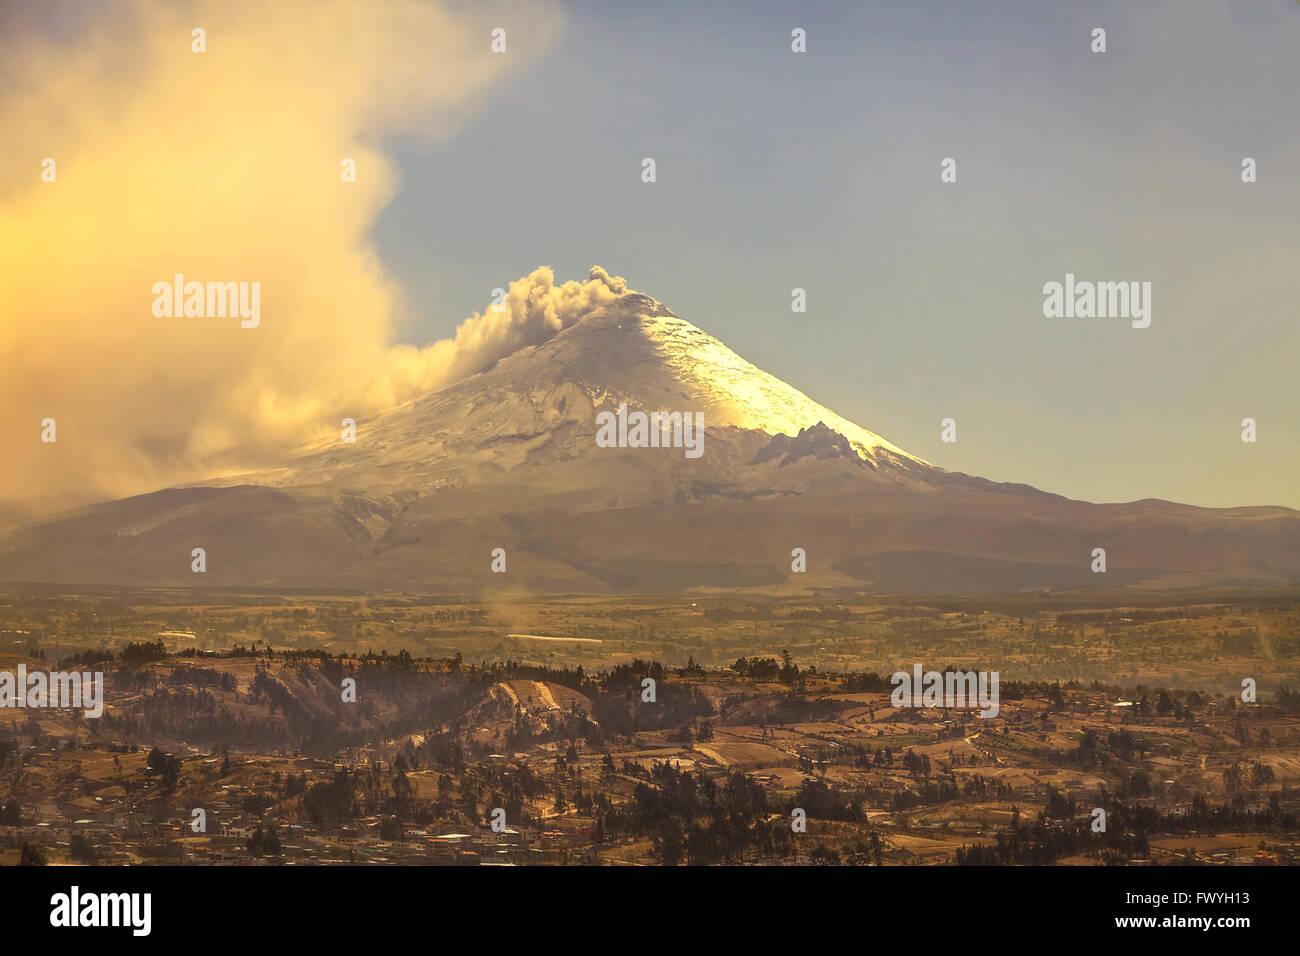 Cotopaxi Vulkan ist der höchste Gipfel In Ecuador, Südamerika Stockbild